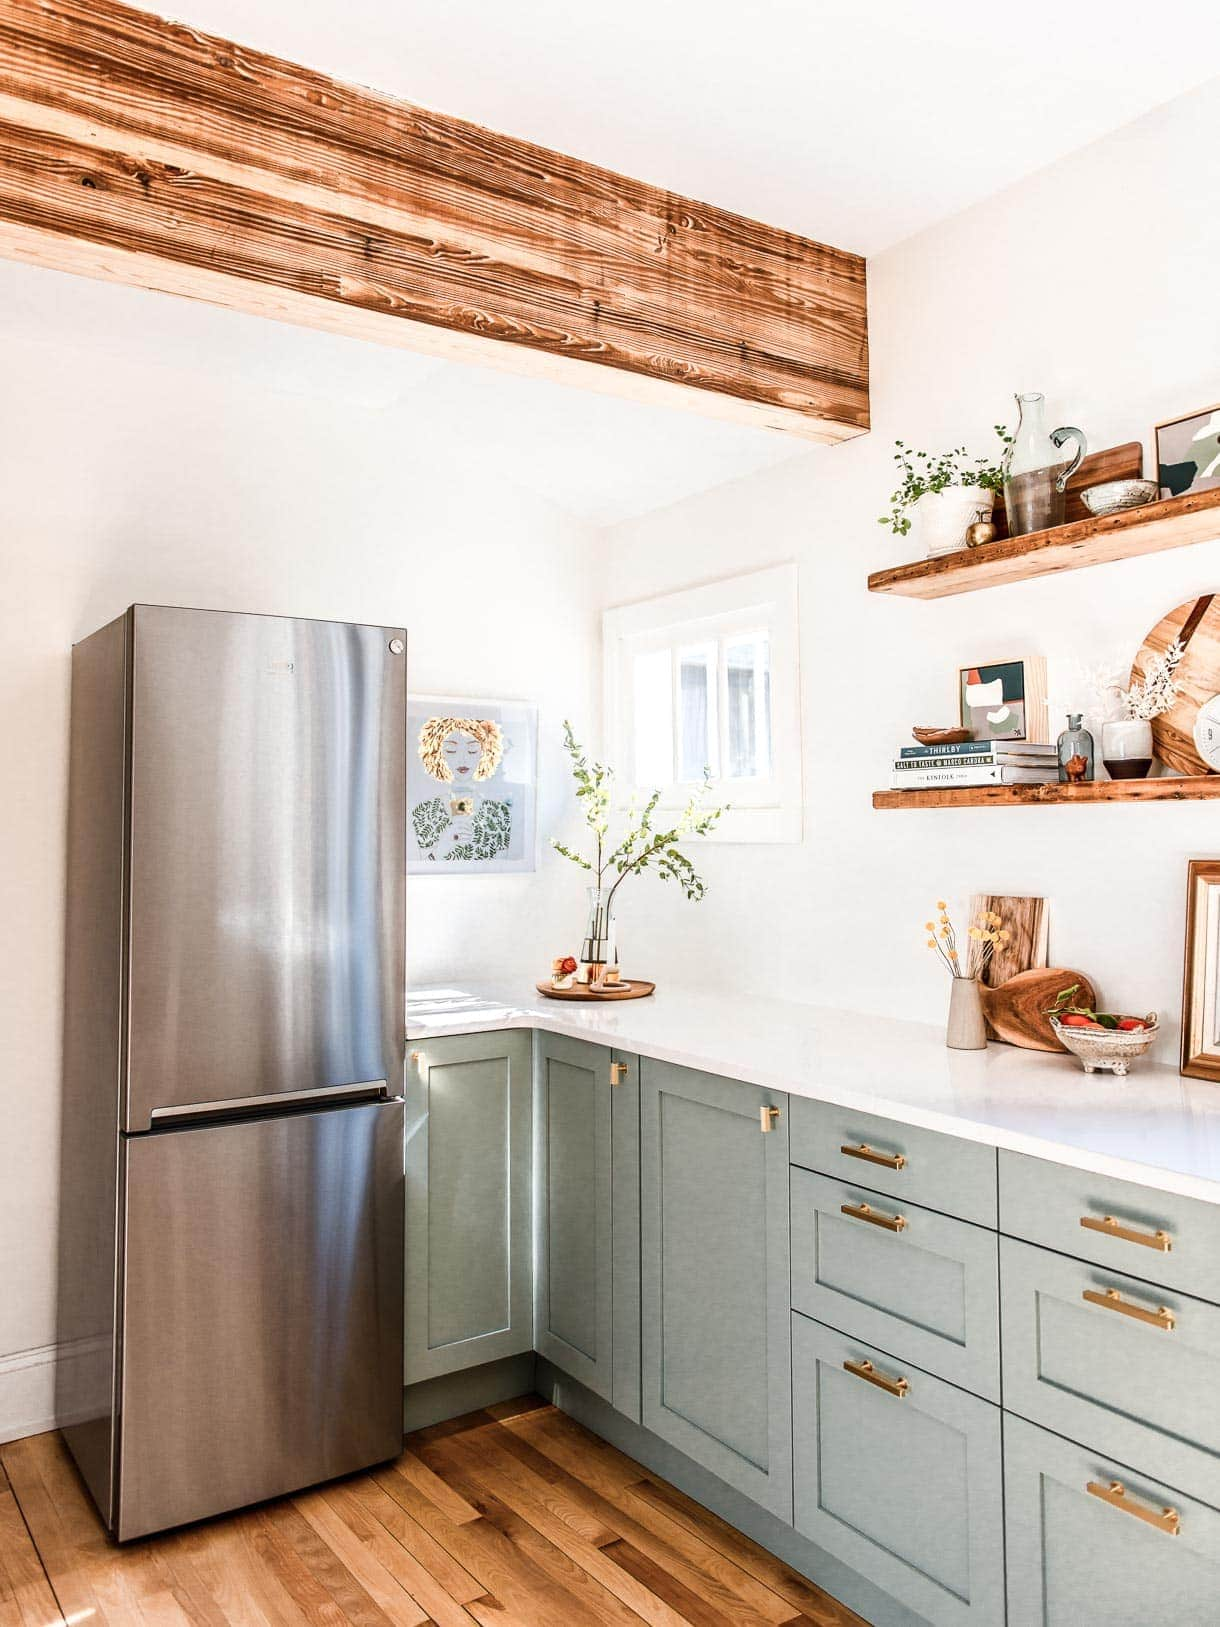 beko refrigerator, semihandmade DIY cabinets, corner kitchen nook